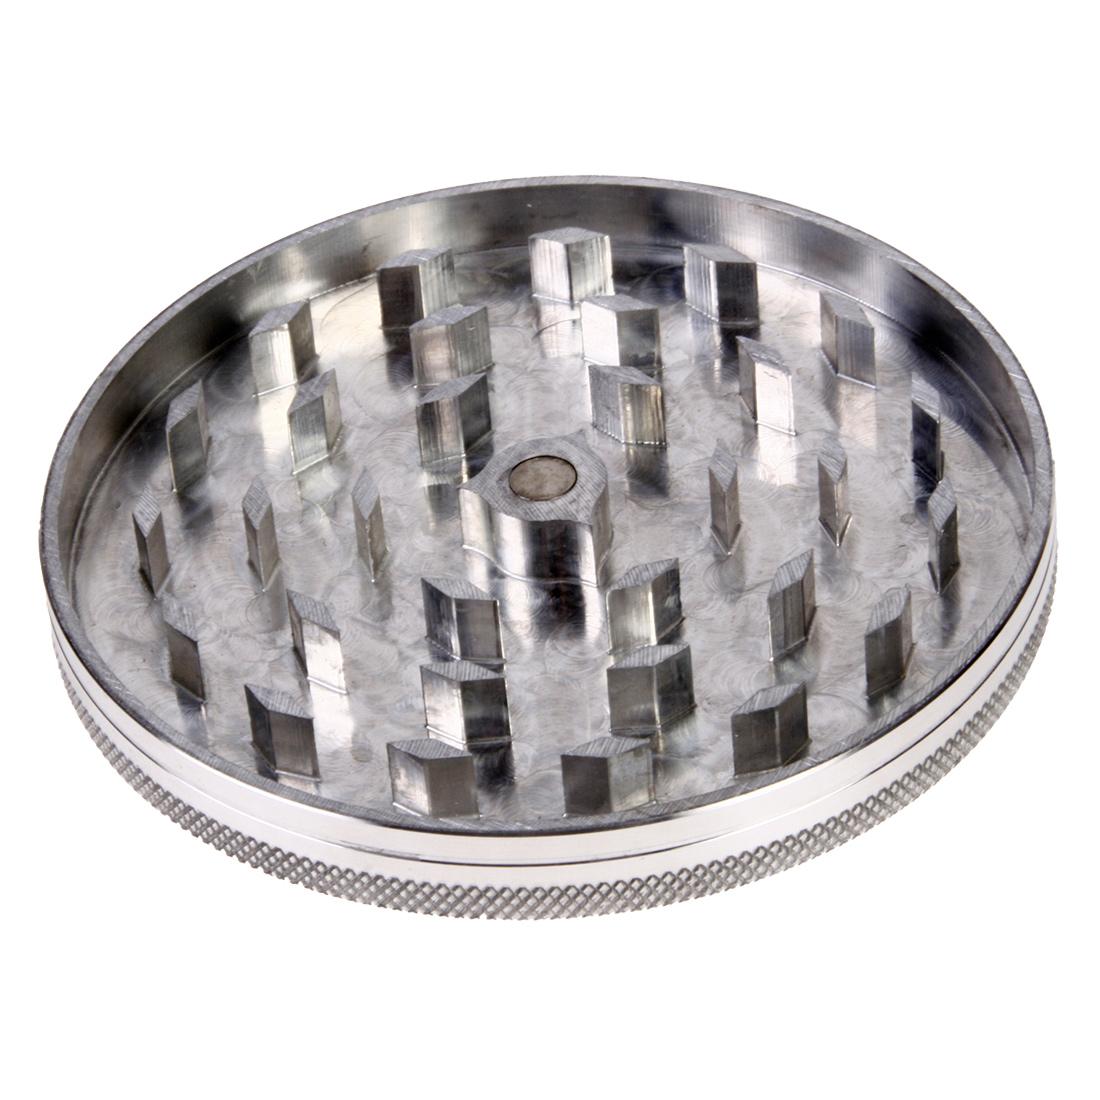 grinder aluminium 2 parties de 90mm